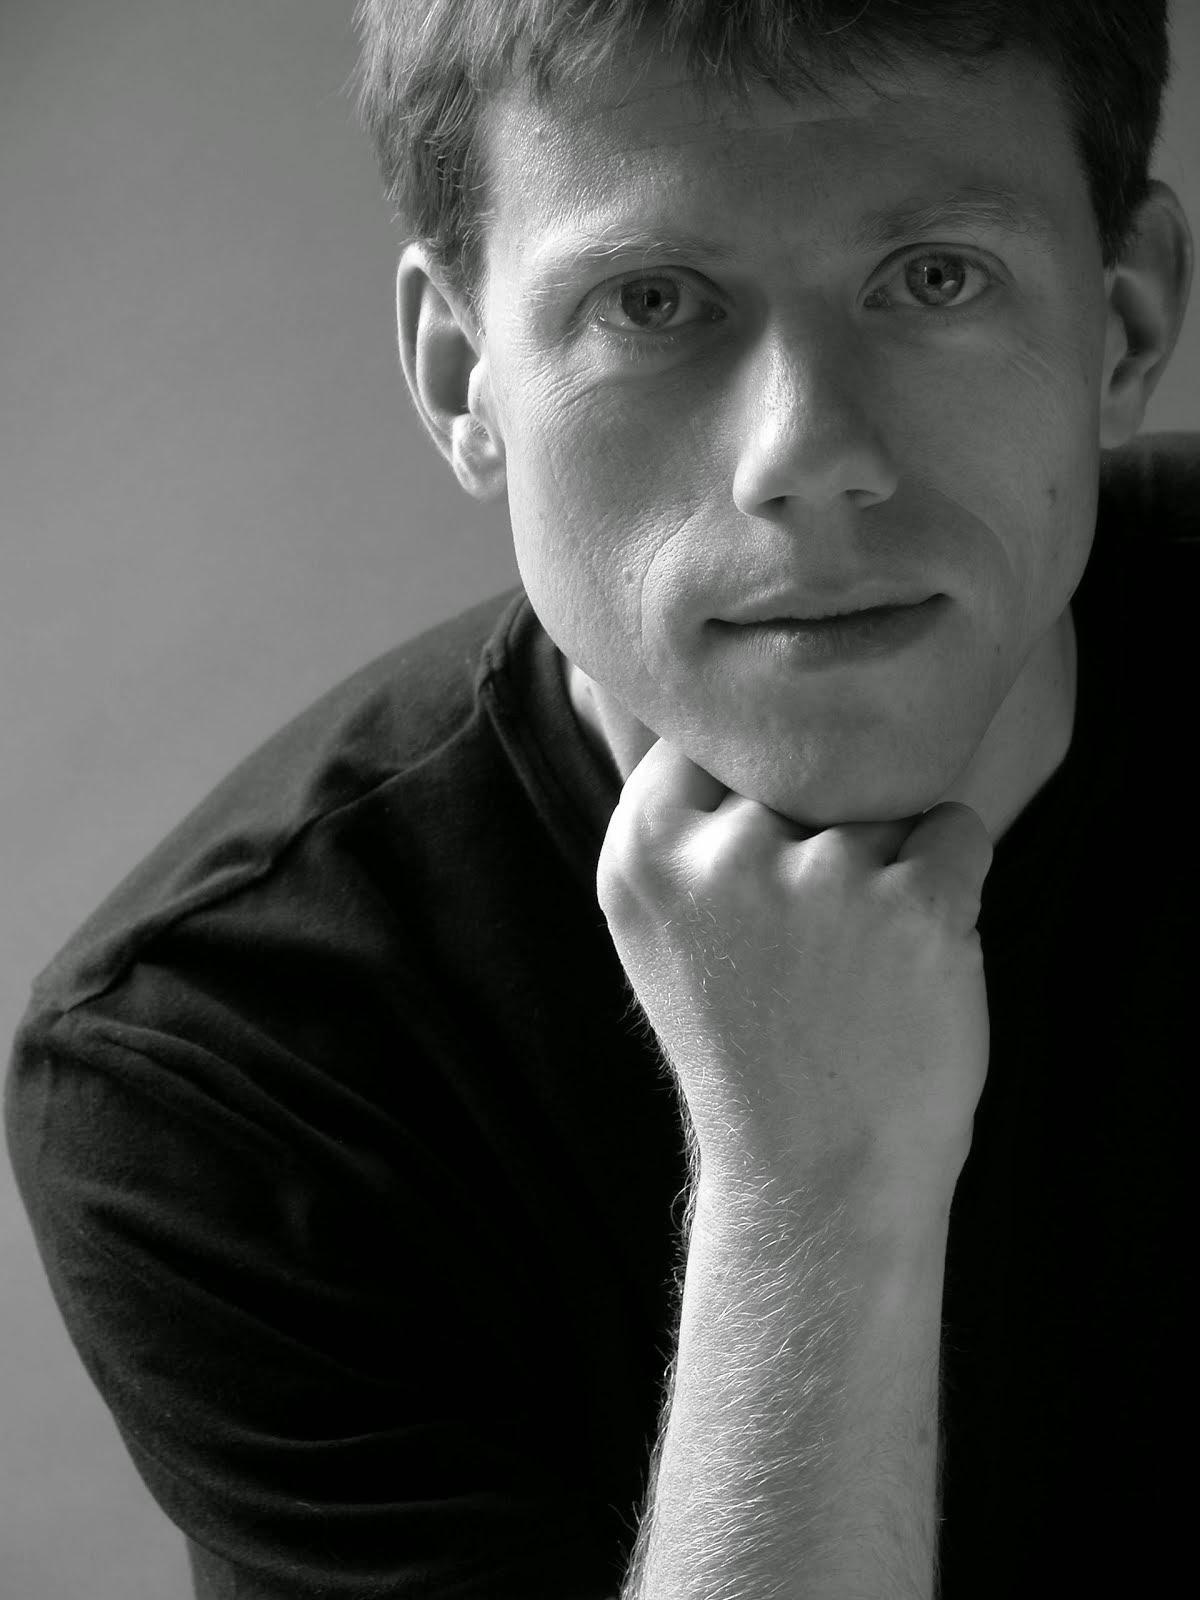 Orlando Jopling